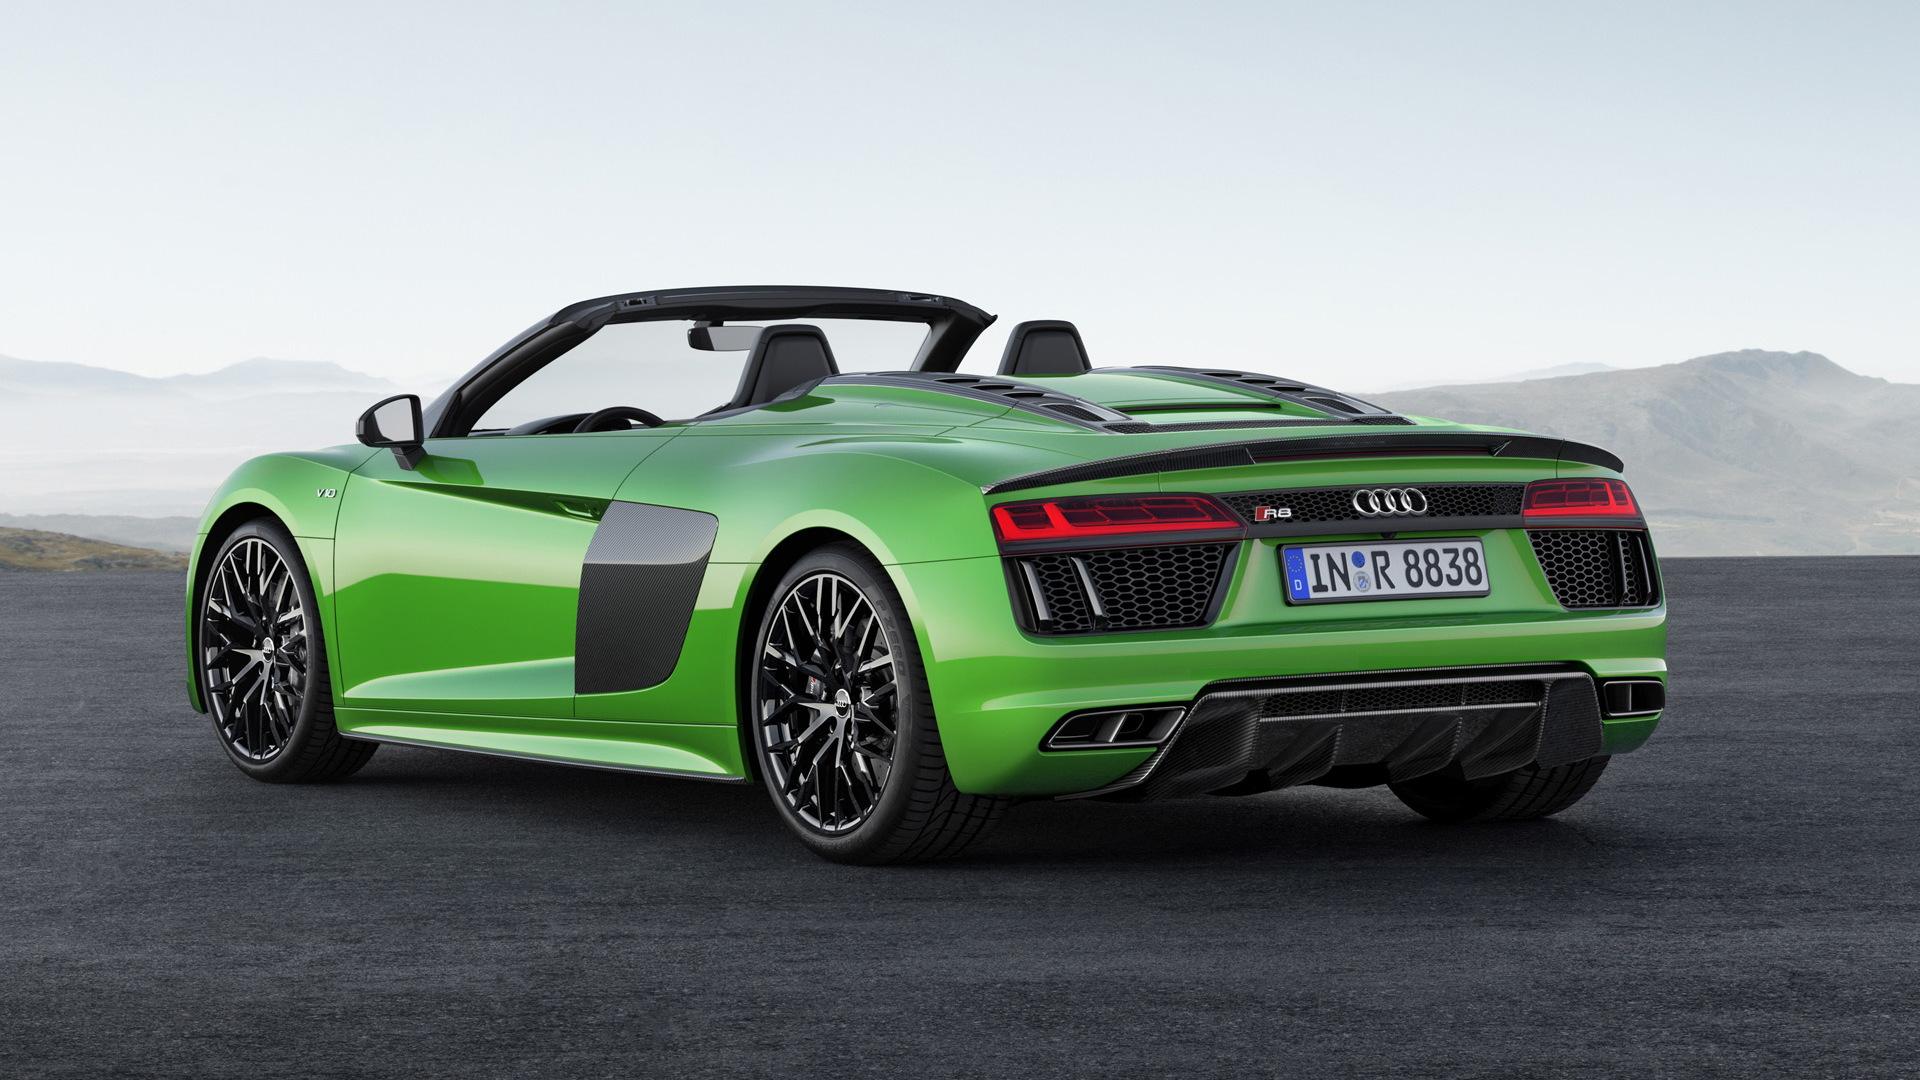 2018 Audi R8 Spyder V10 Plus